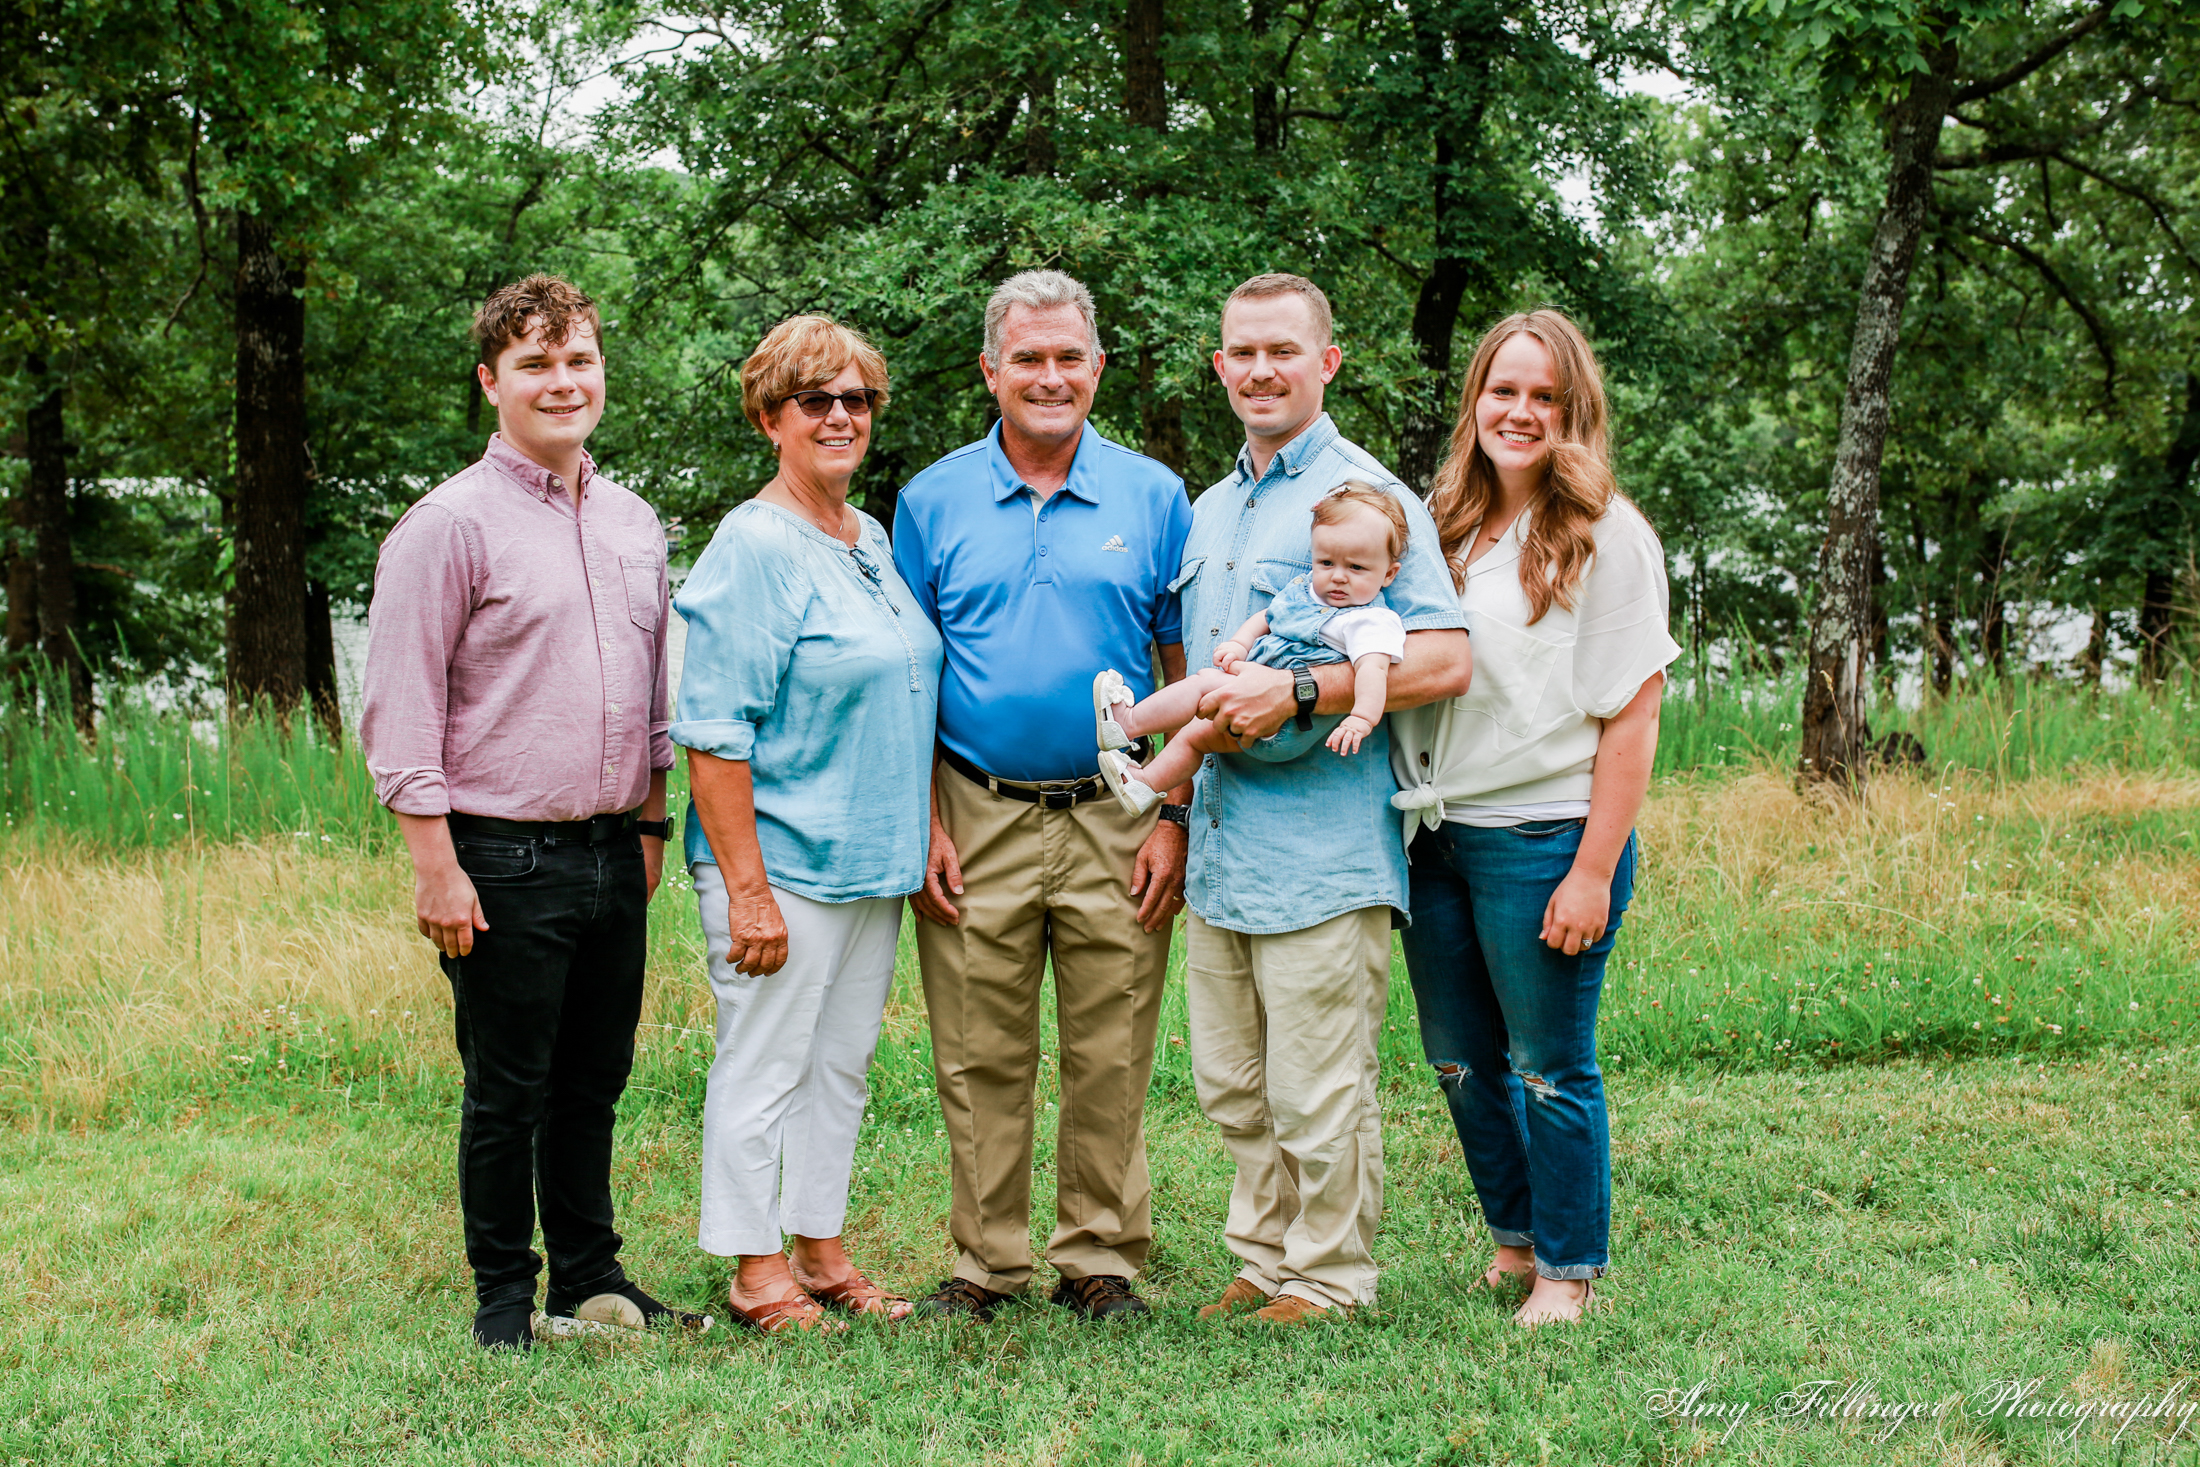 Branson extended family photos